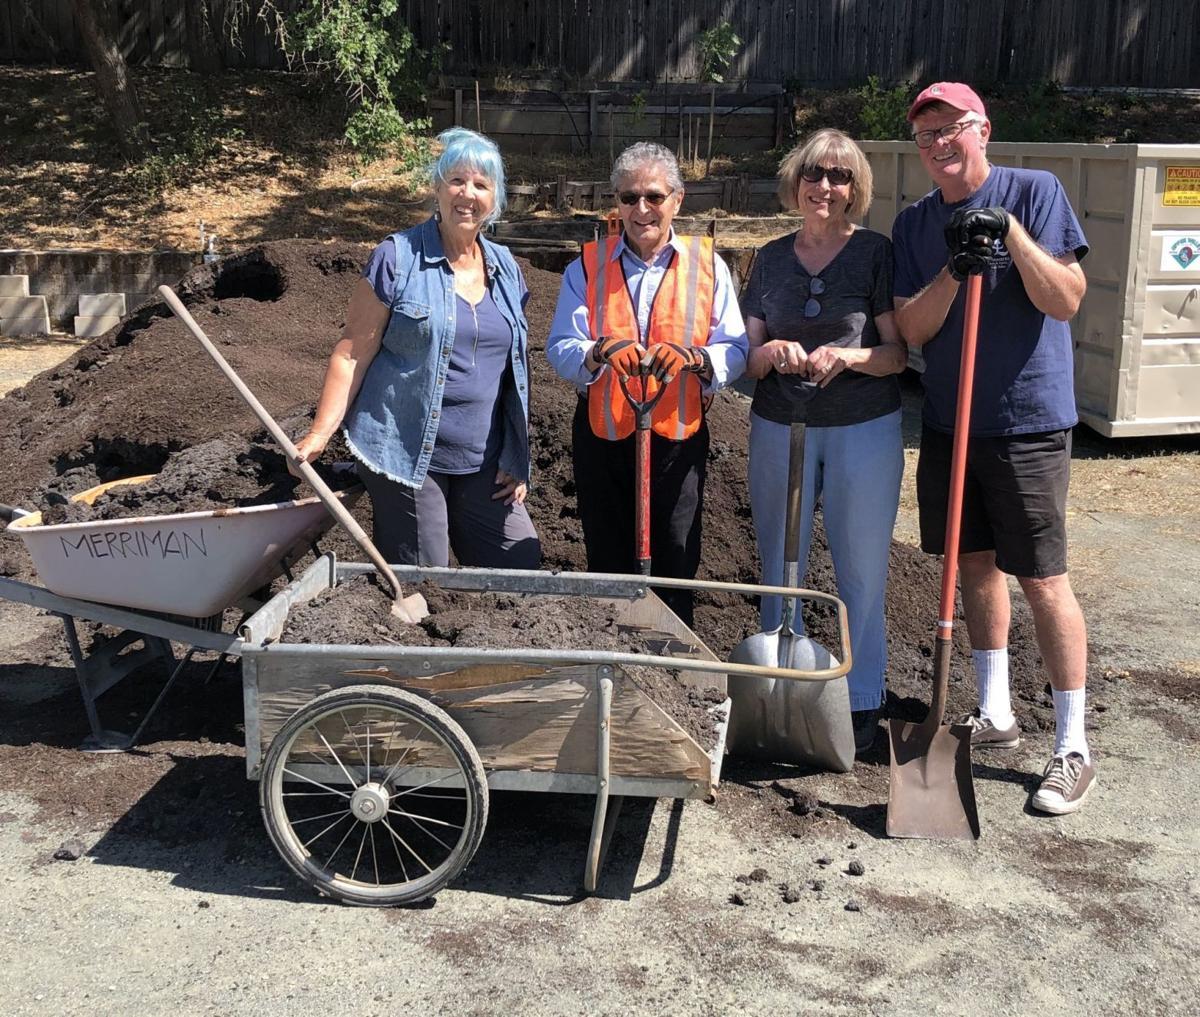 Upper Valley Disposal Service donates mulch to Vineyard Valley in St. Helena